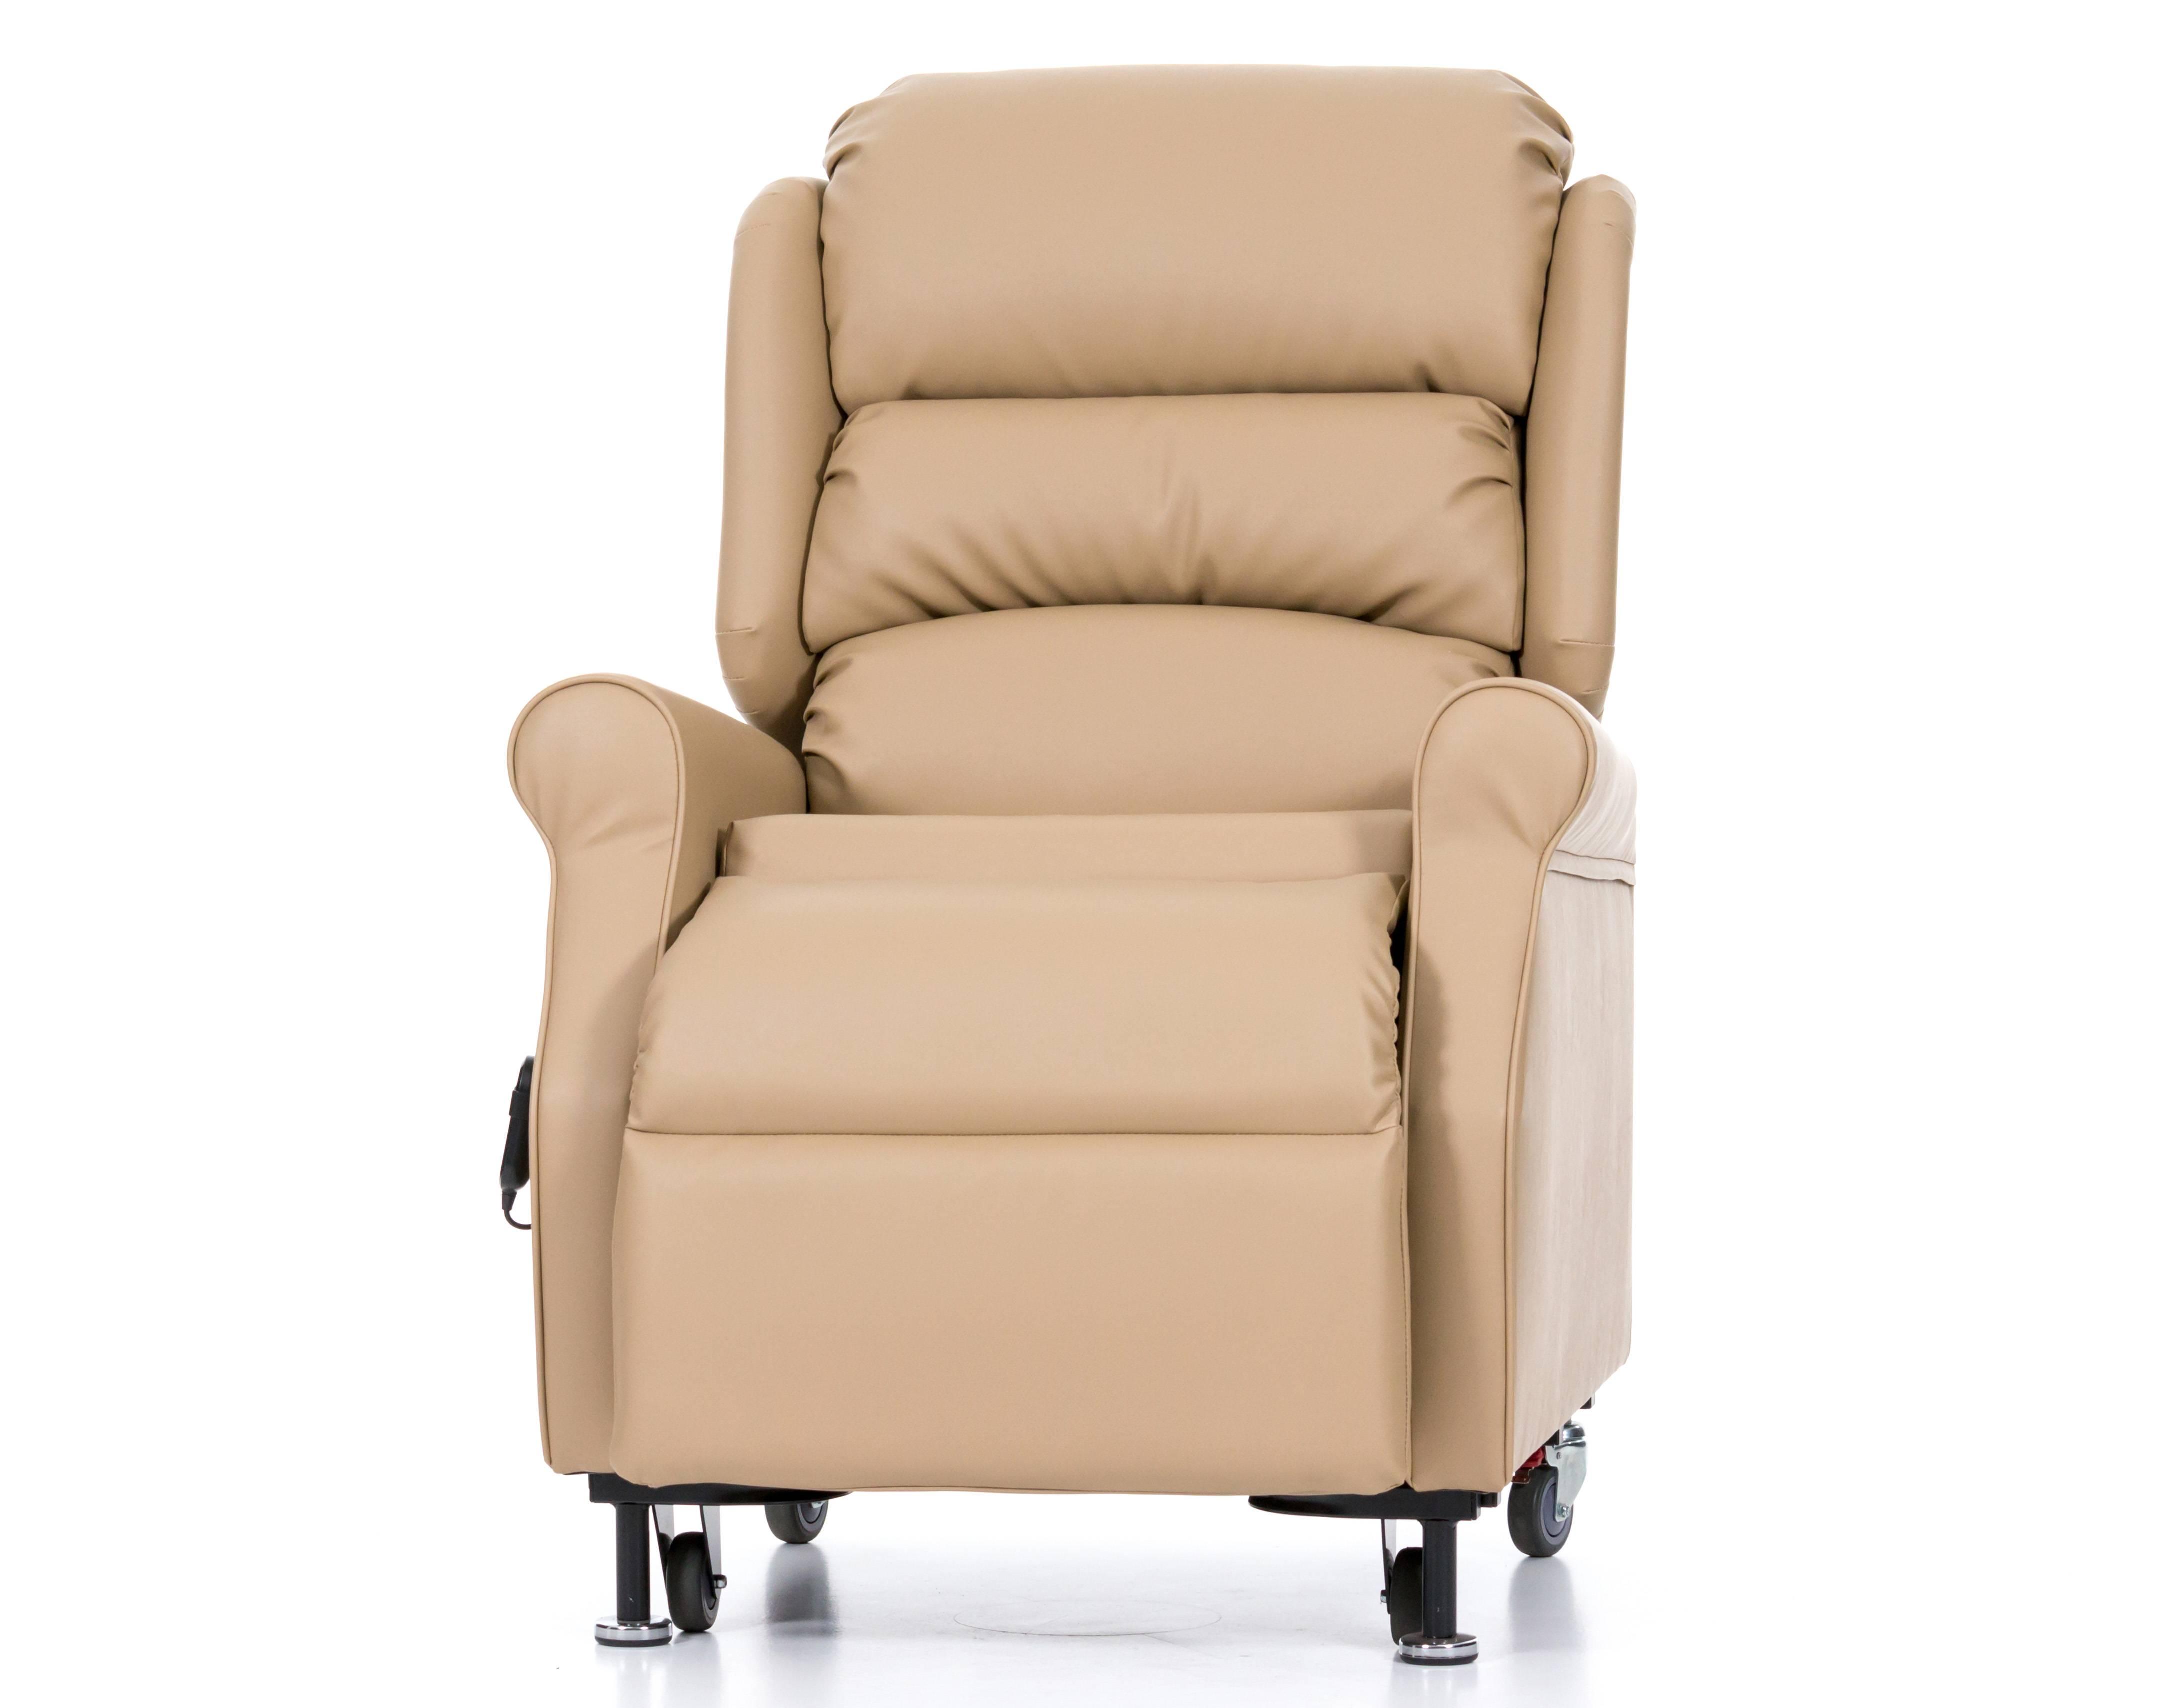 pflegesessel melbourne mit rollen im rehashop kaufen. Black Bedroom Furniture Sets. Home Design Ideas